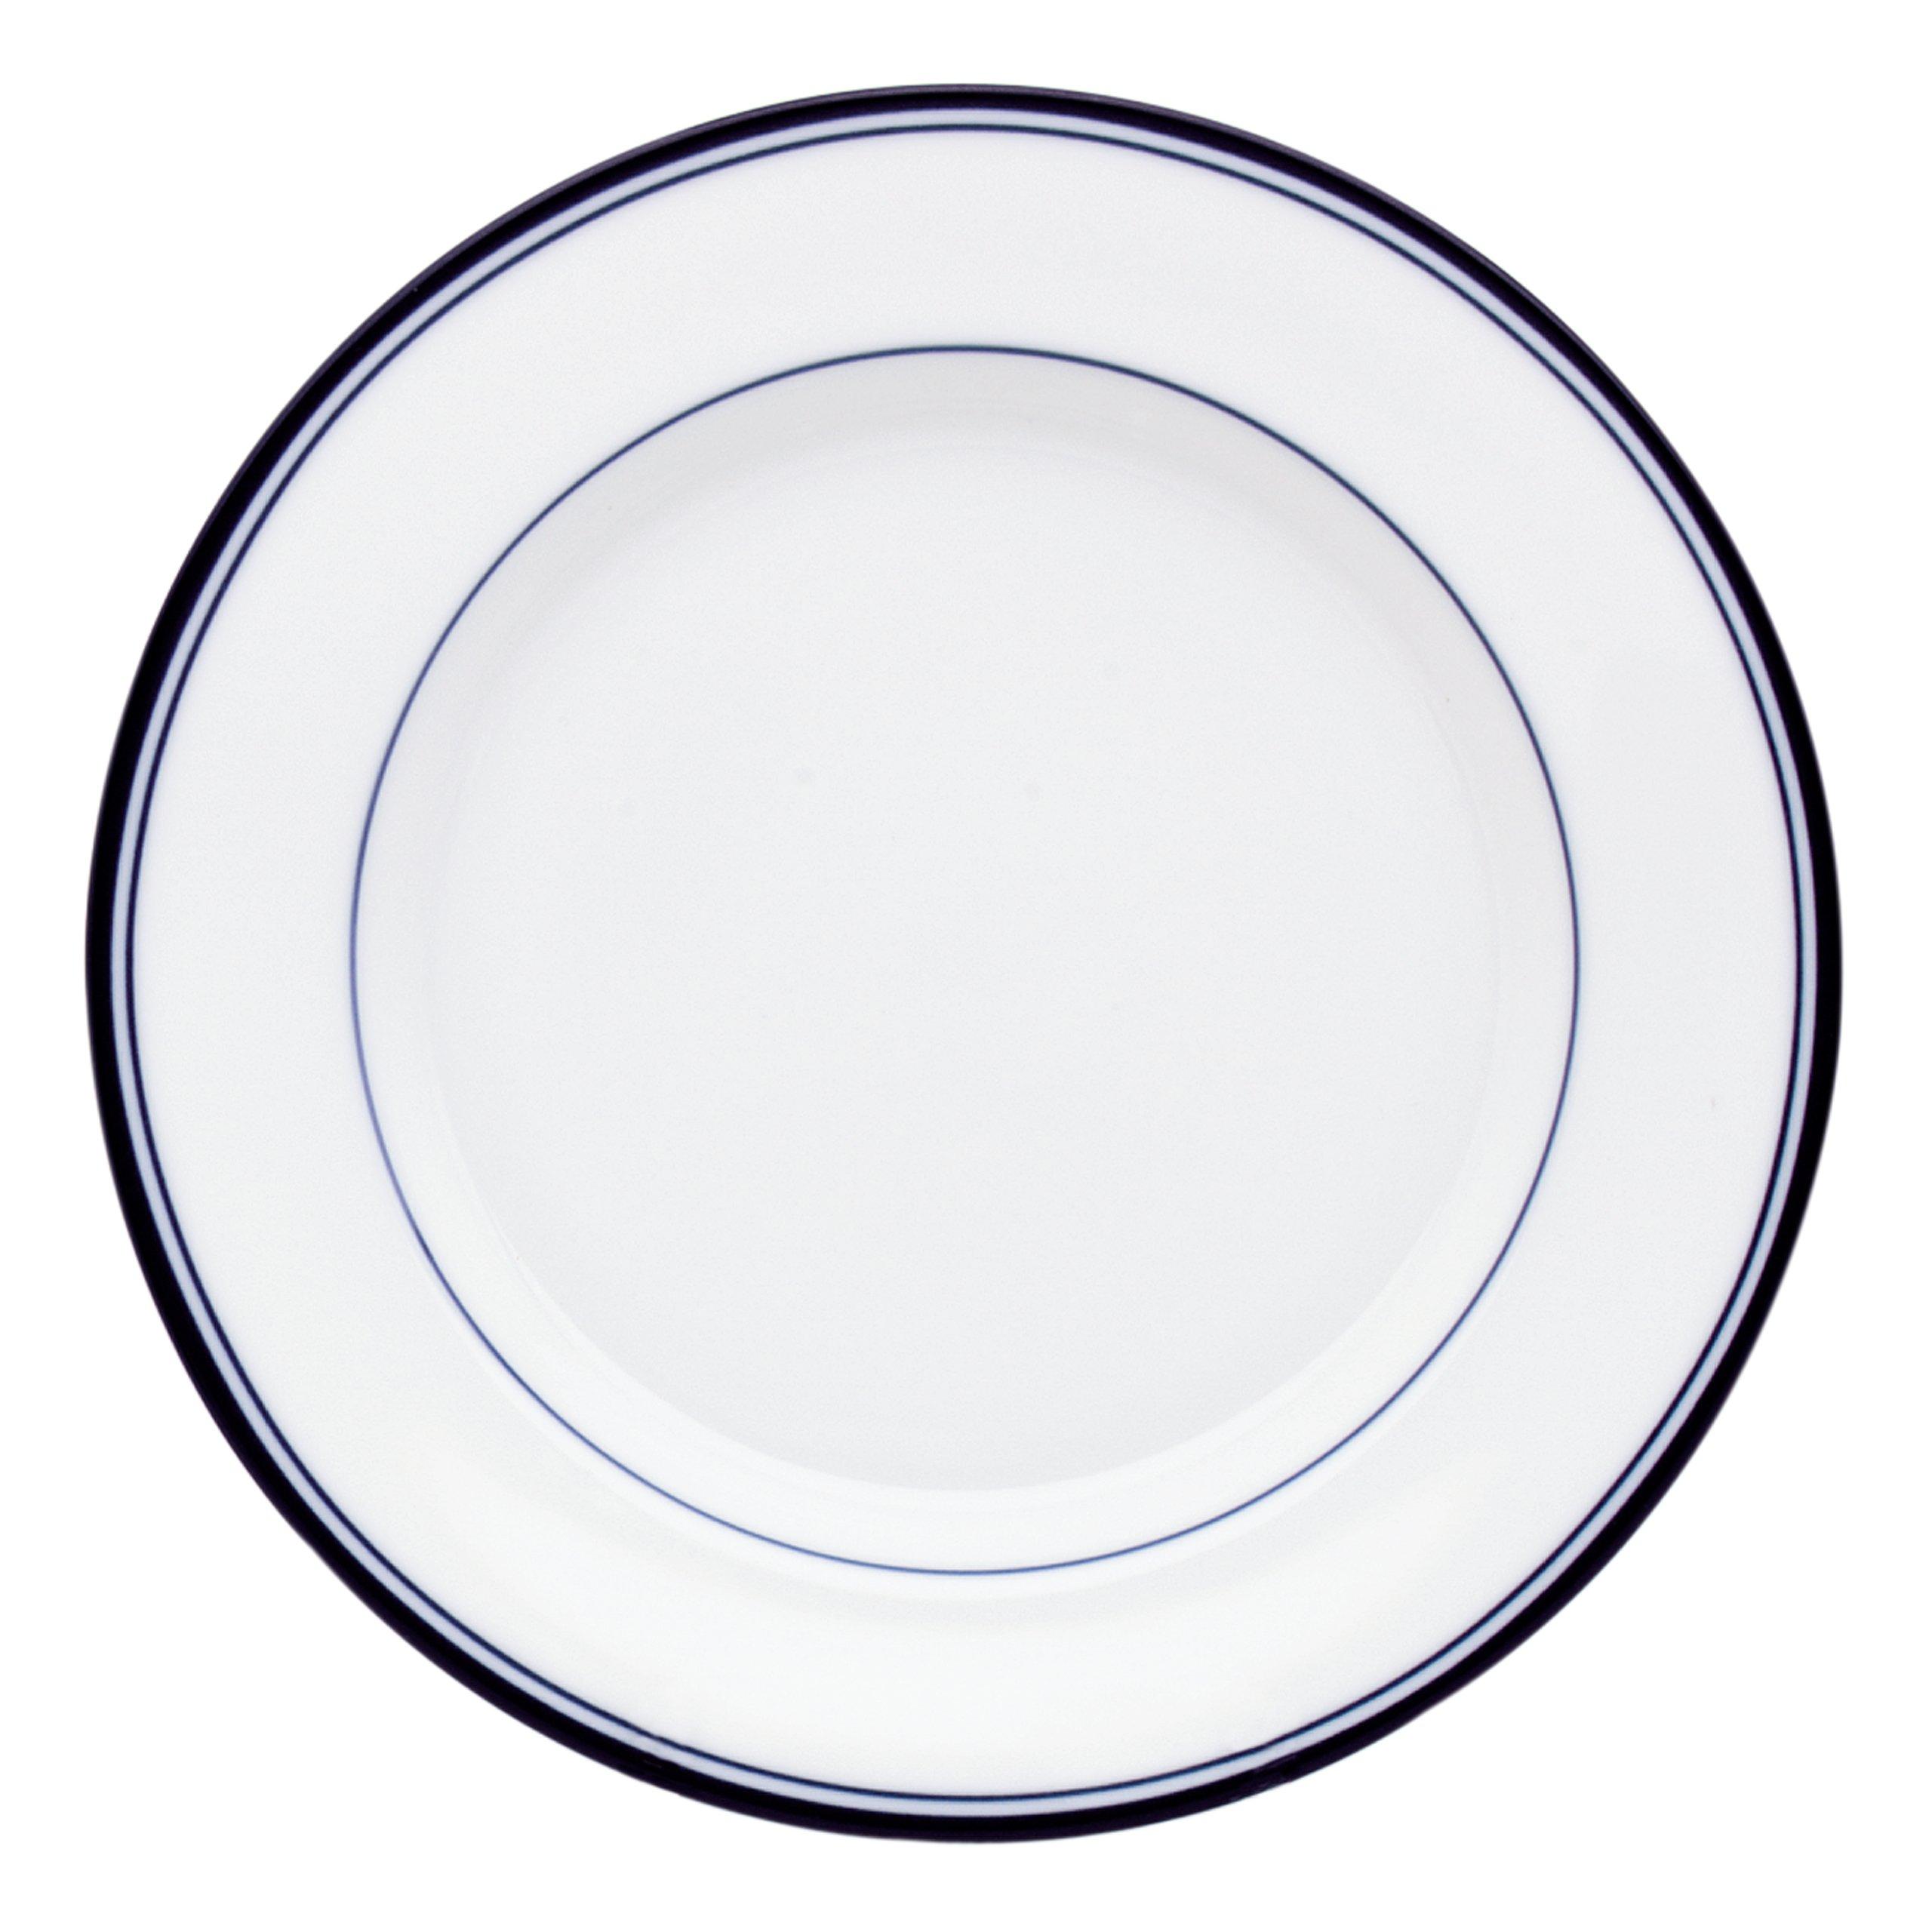 Dansk Concerto Allegro Bread and Butter Plate, Blue